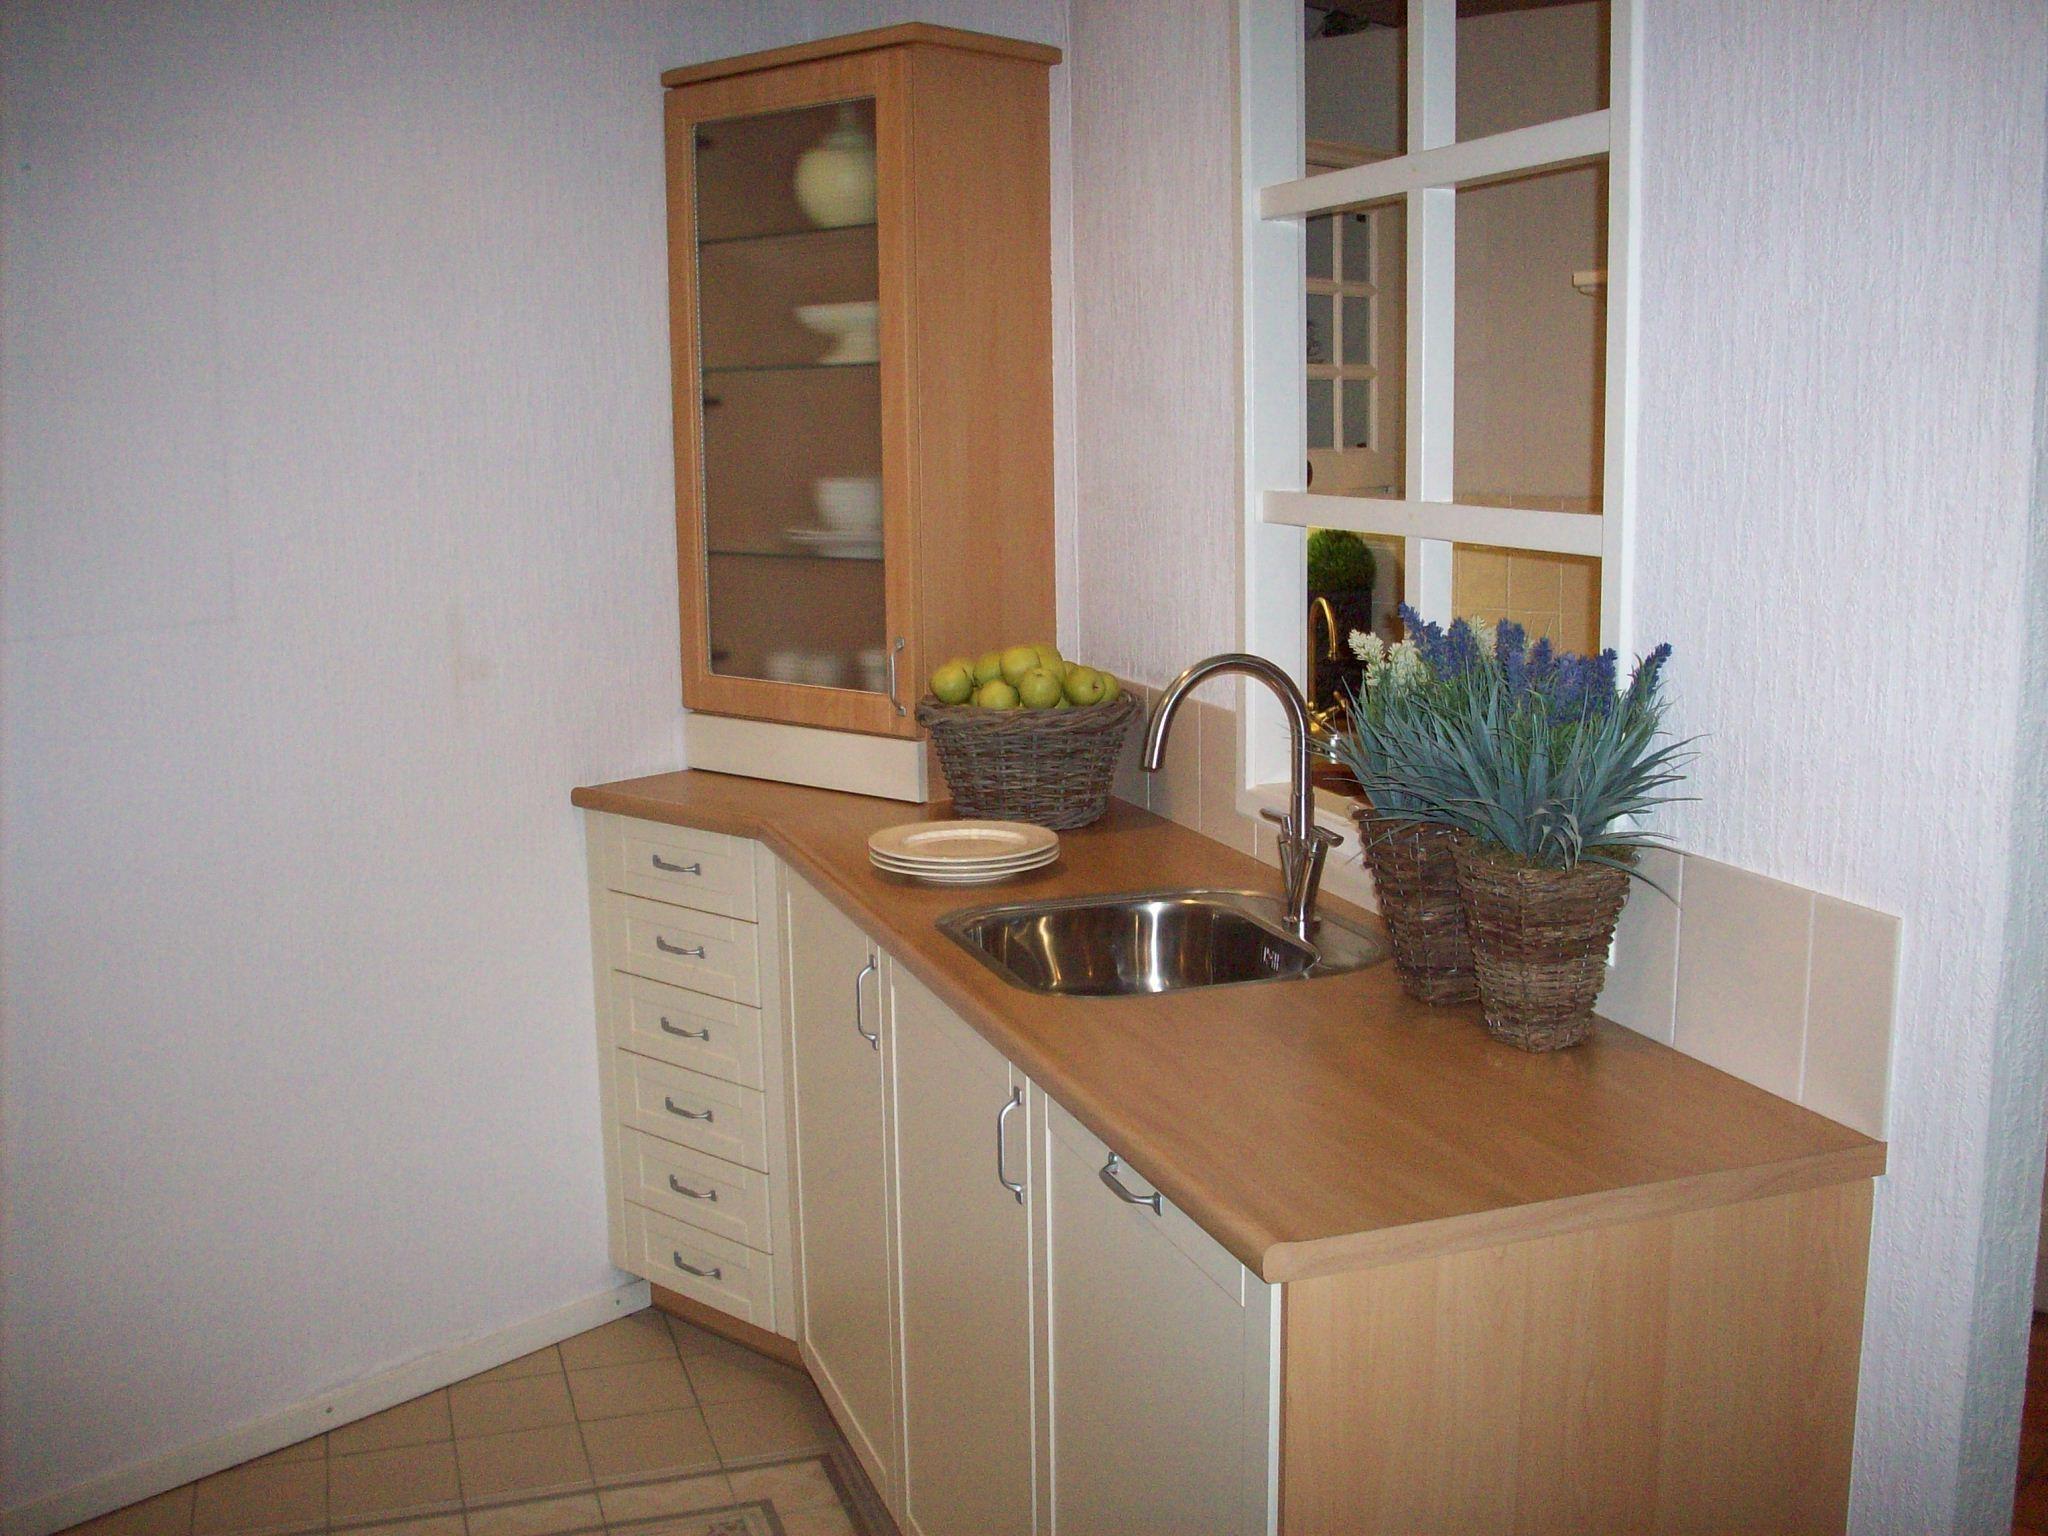 Design Keuken Showroommodel : ... Nederland! Showroom model keuken in ...